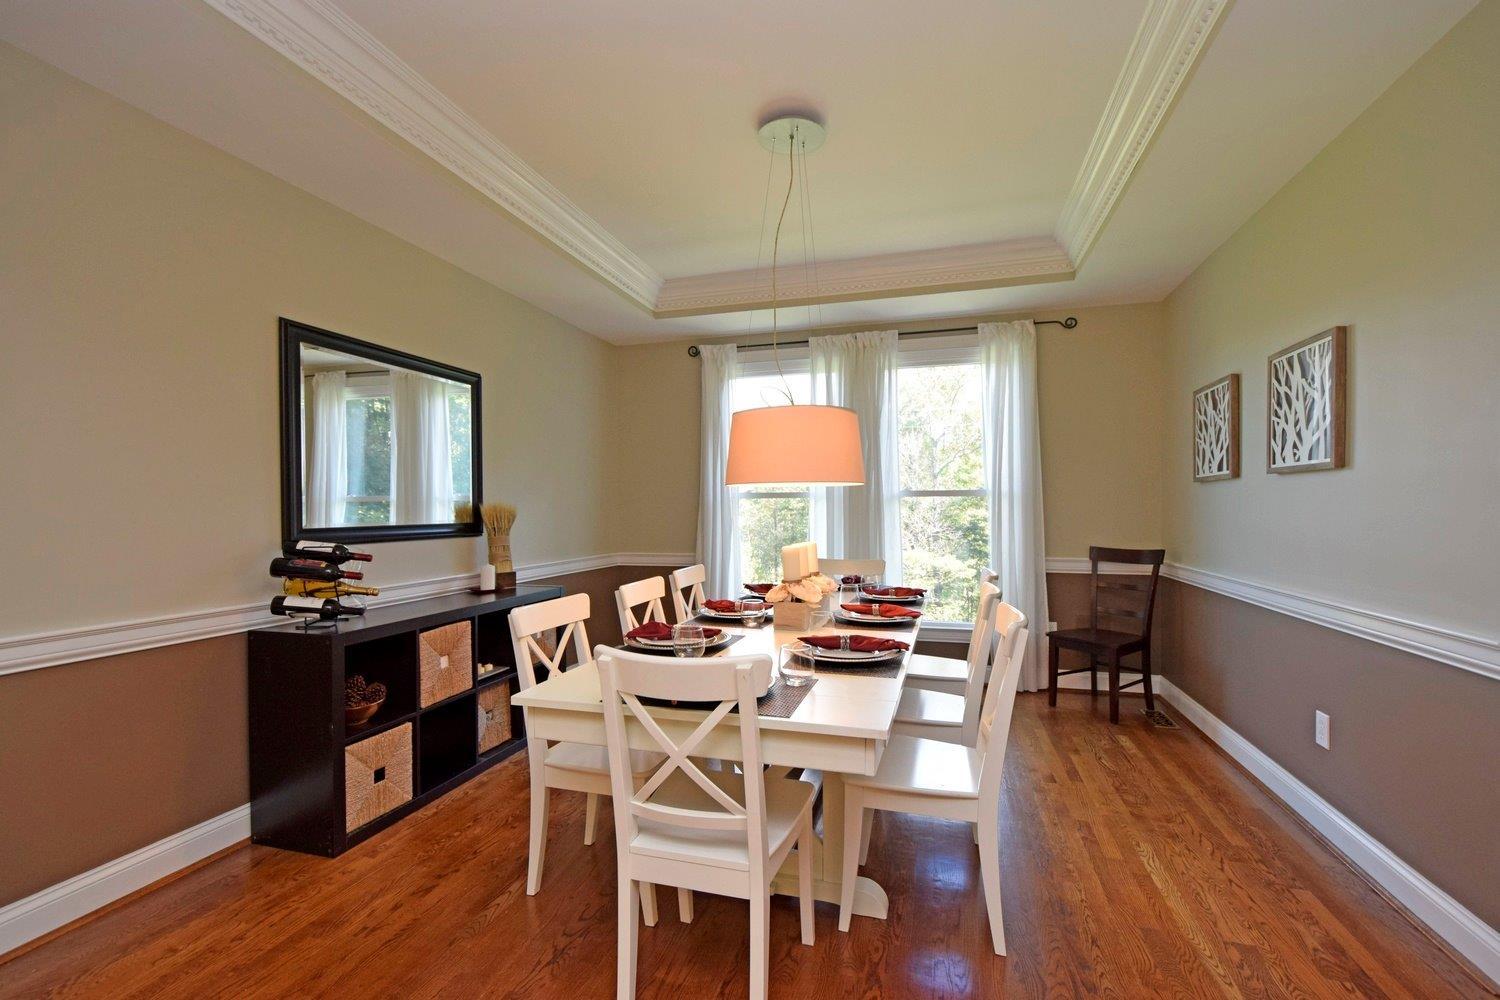 Property for sale at 106 Shingleoak Drive, Loveland,  OH 45140